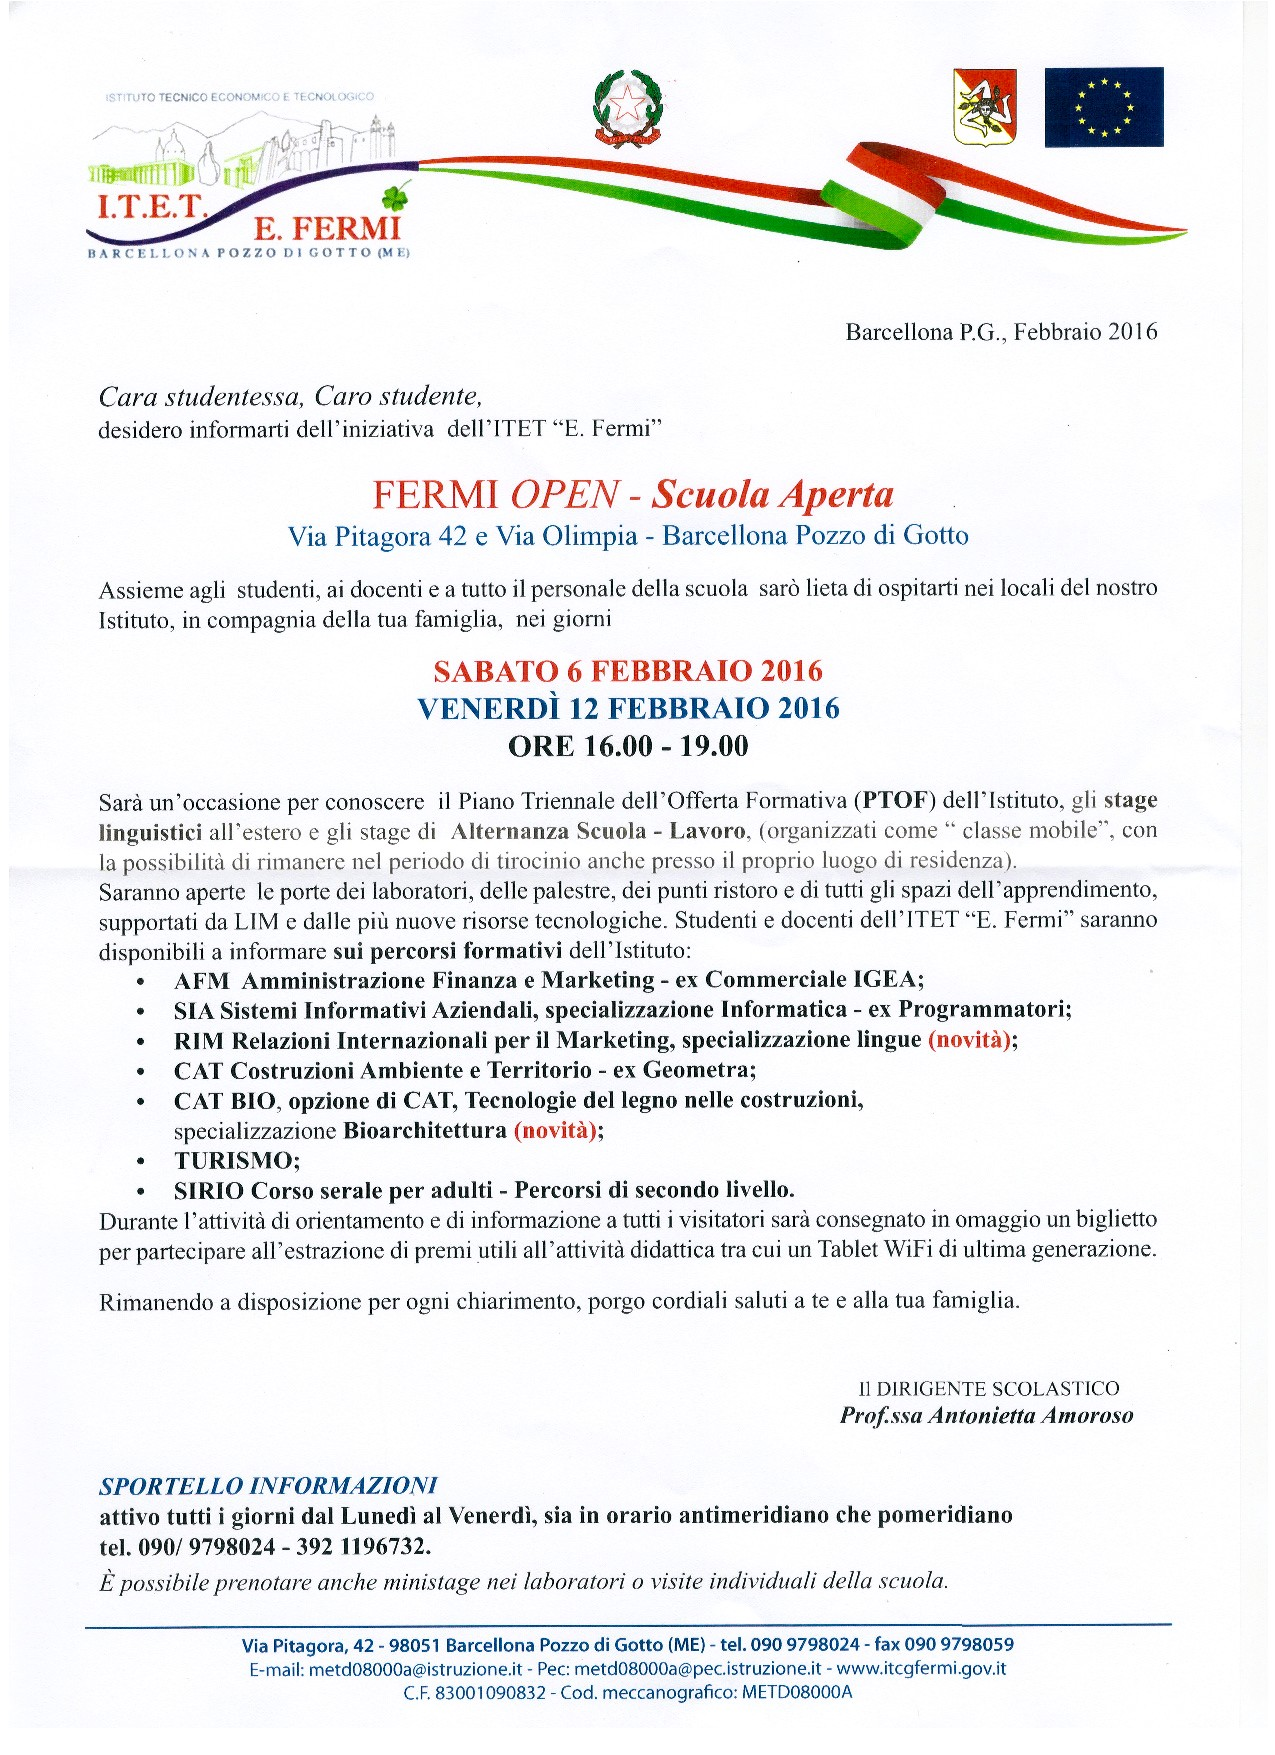 Open Day 6 febbraio 2016